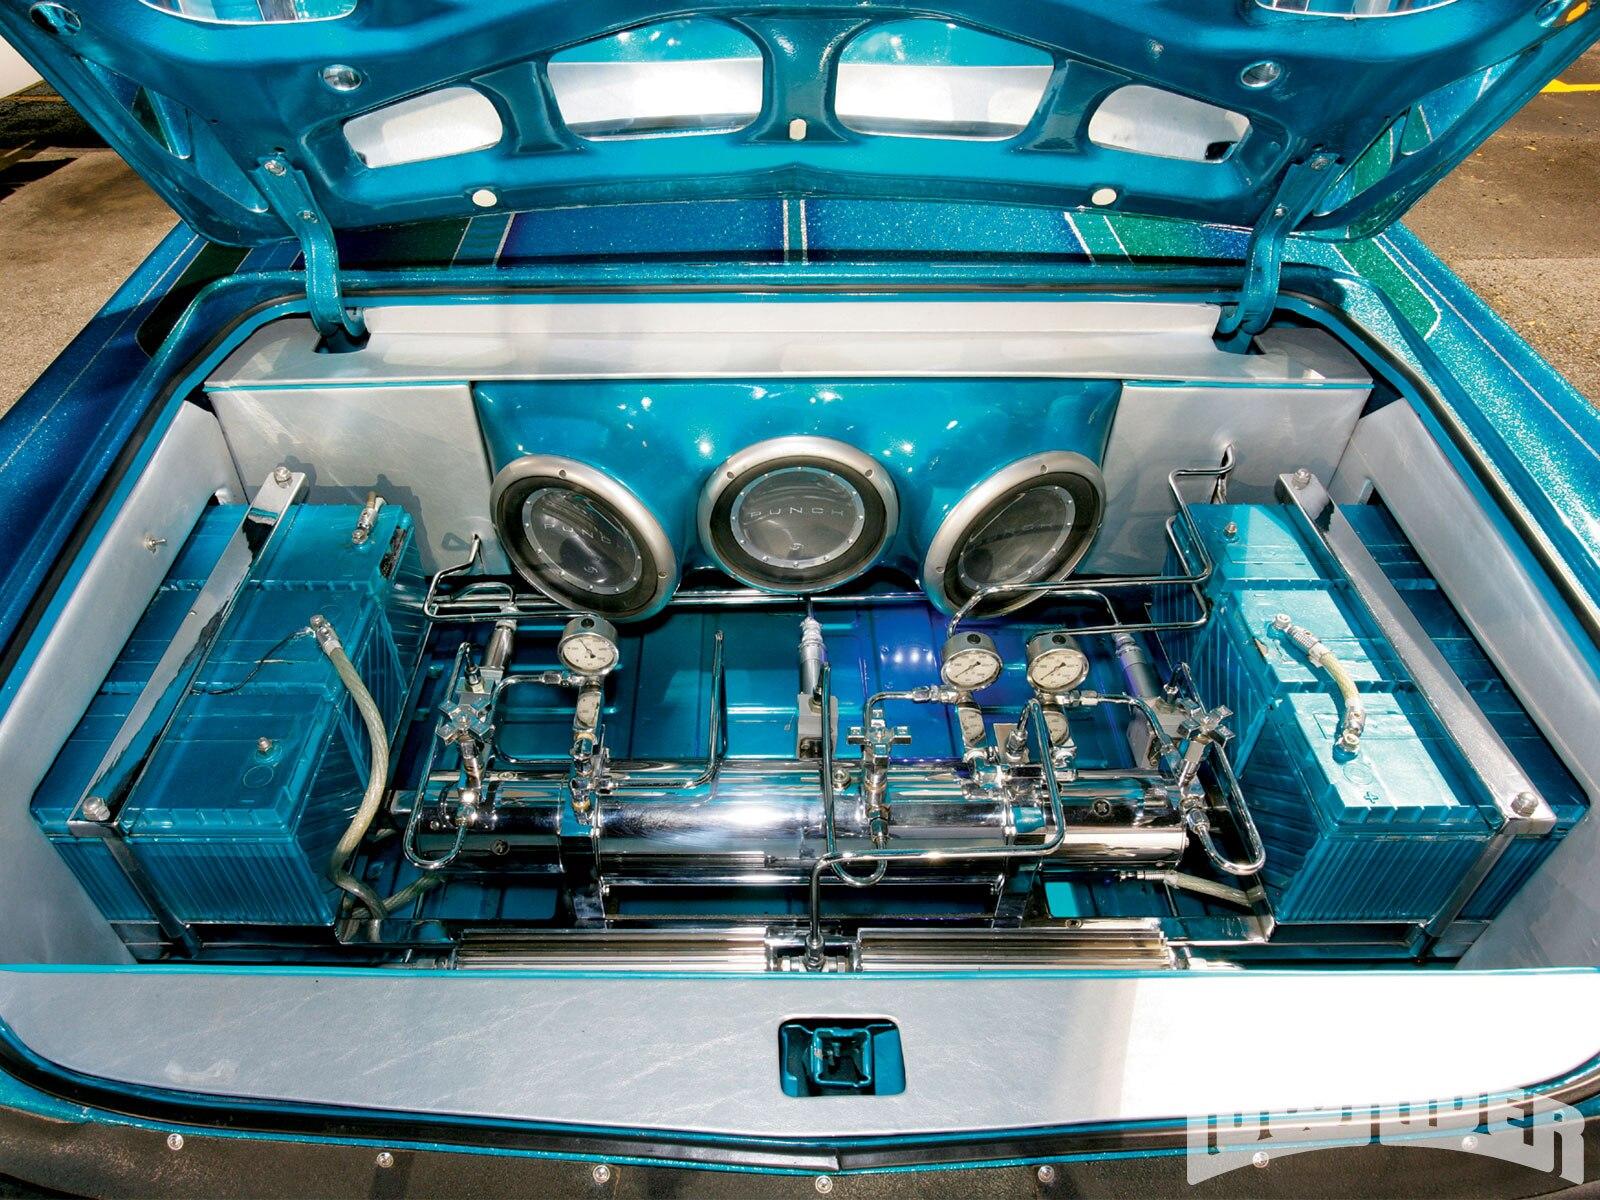 lrmp_1001_01_o-1968_cadillac_coupe_deville-trunk_setup2